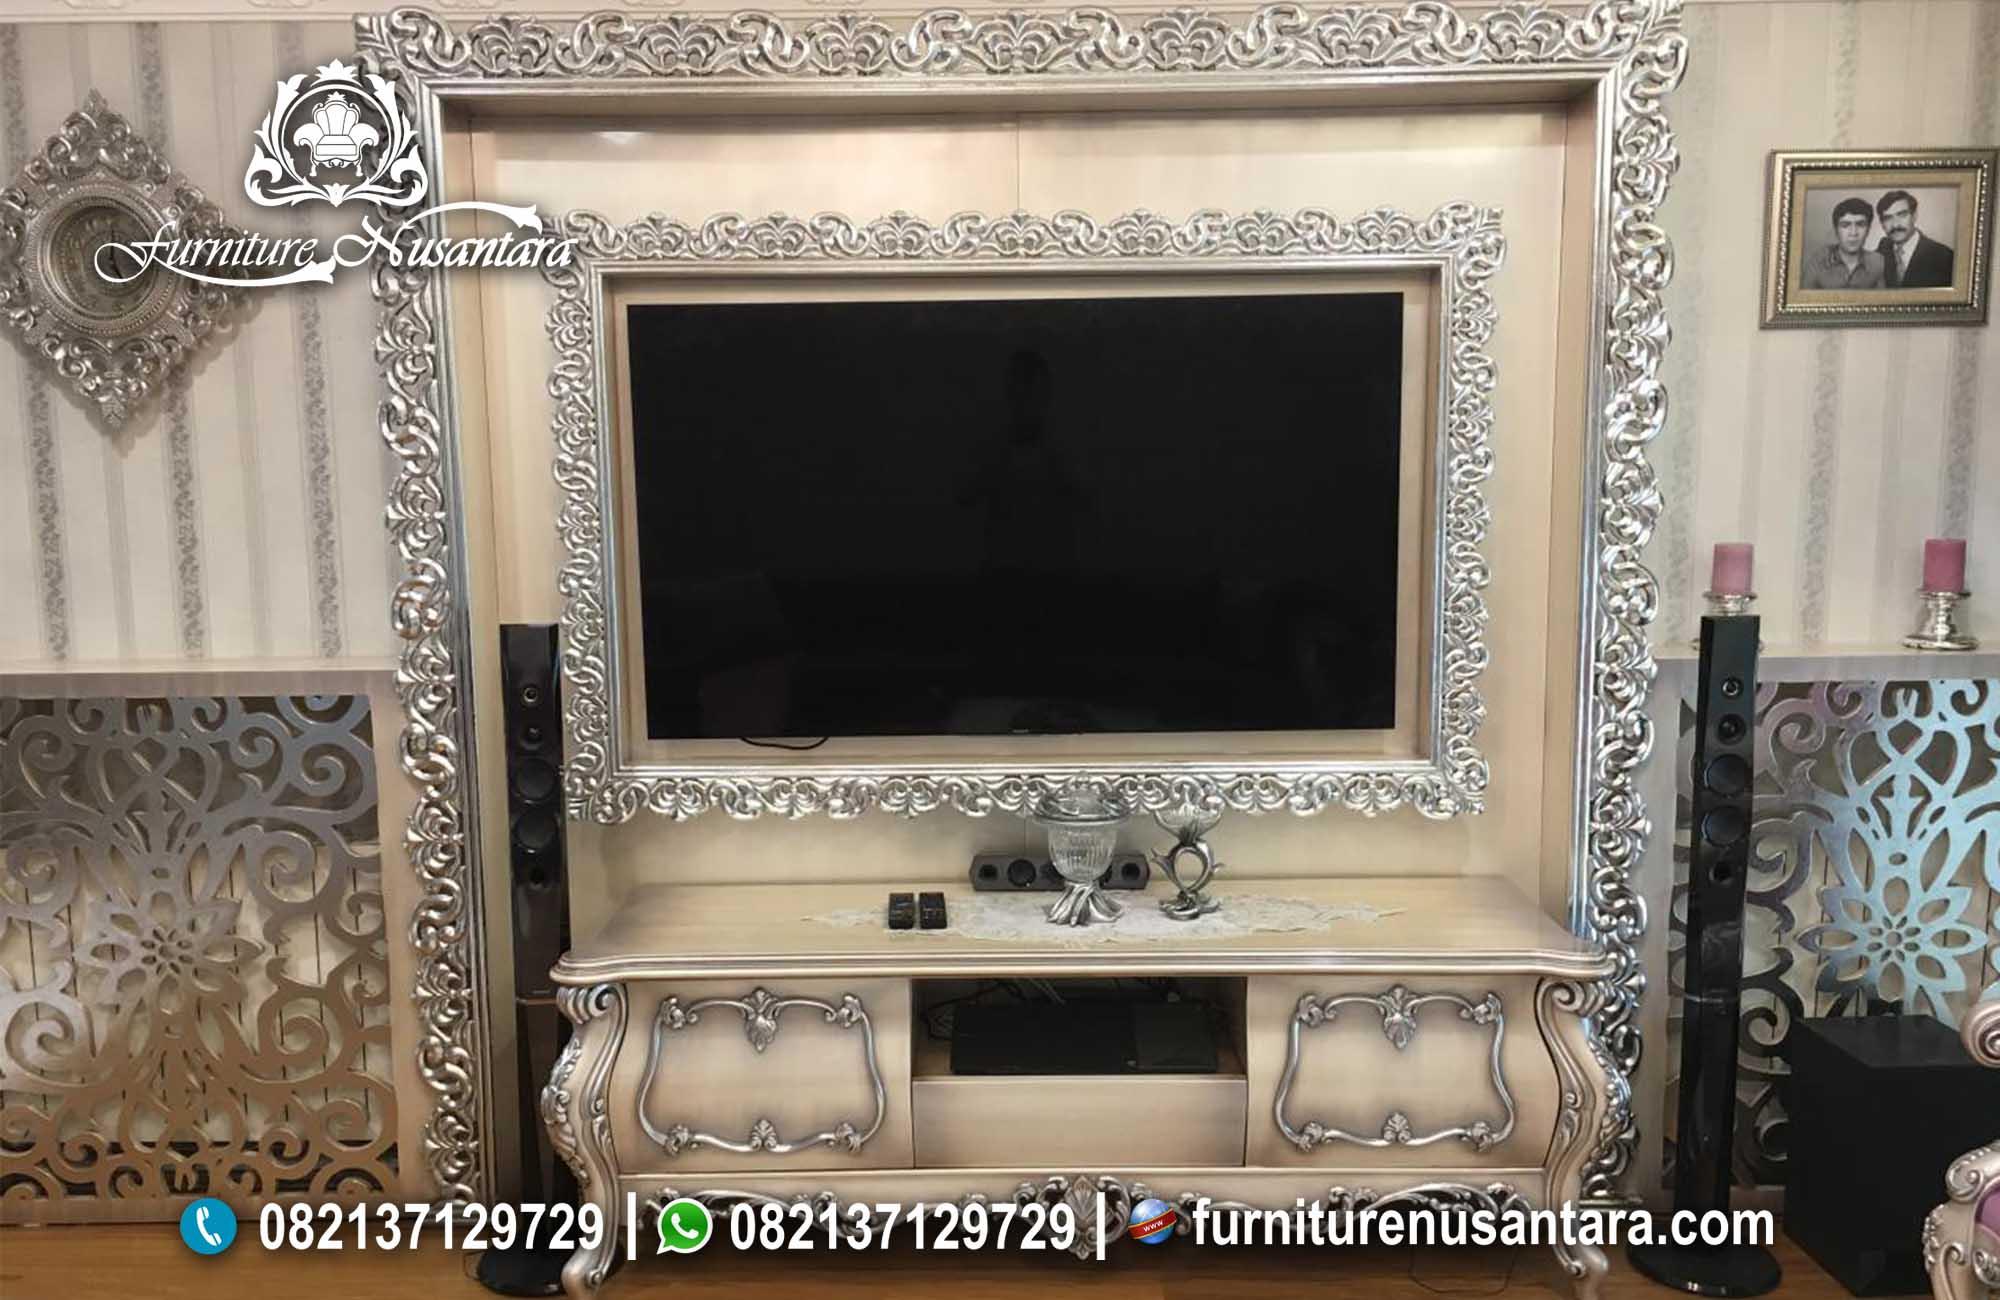 Jual Backdrop TV Ukir Jepara Cream Silver BTV-01